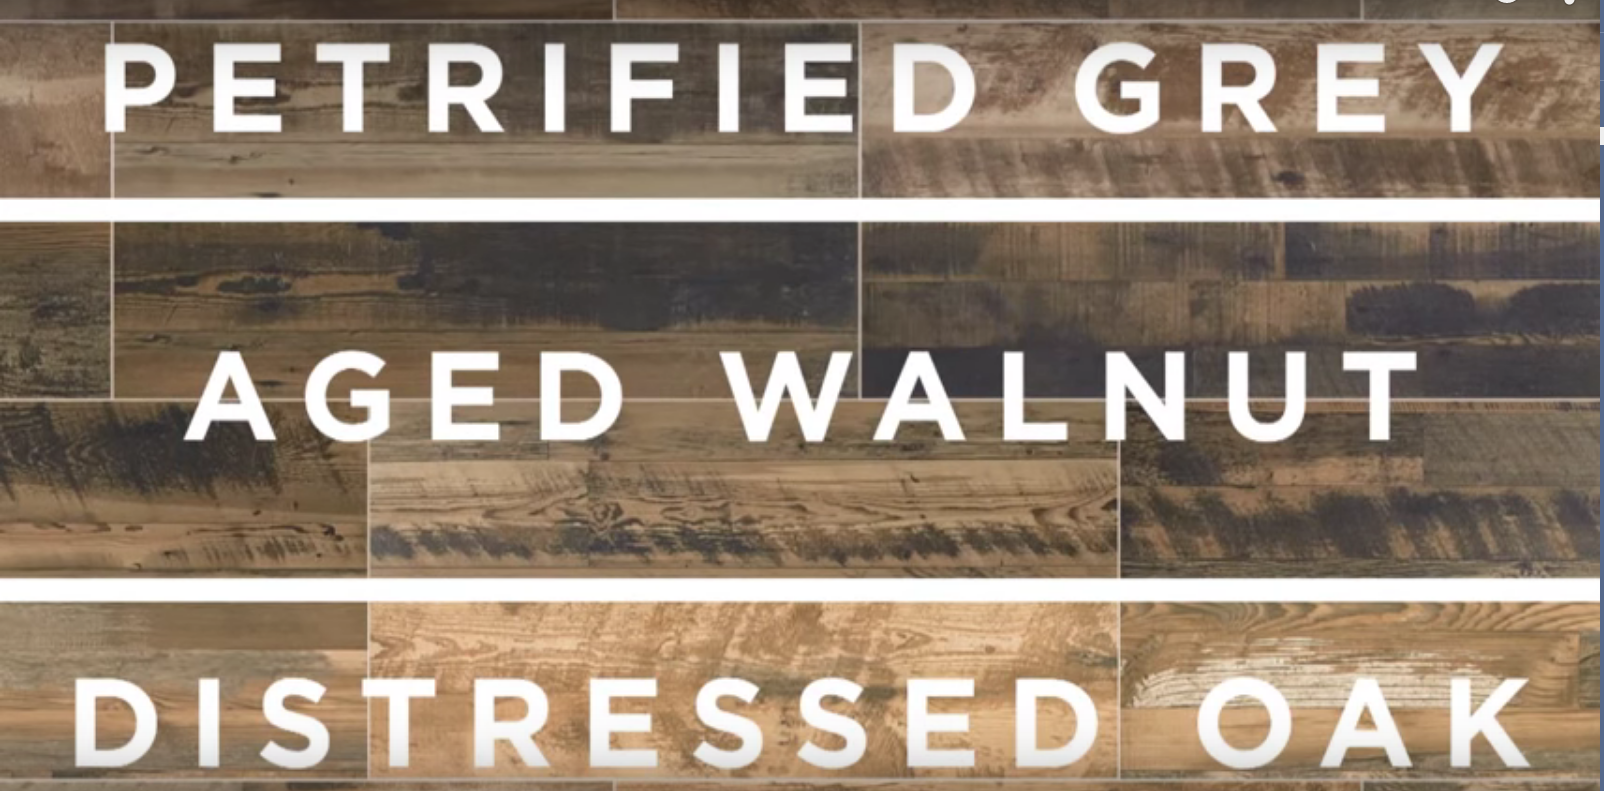 Marazzi Preservation Brings Hardwood Looks to Tile